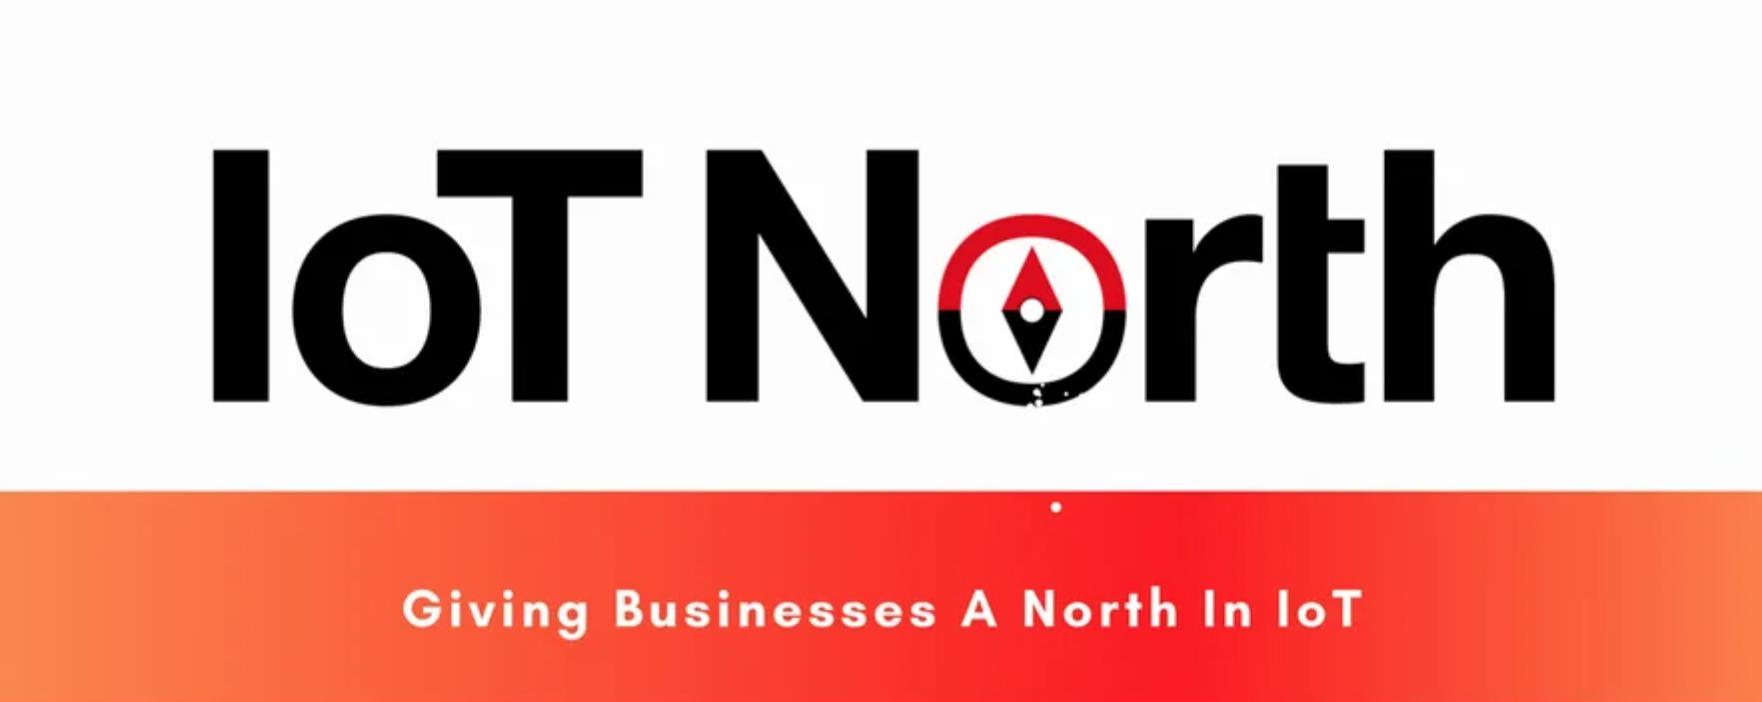 IoT North Logo